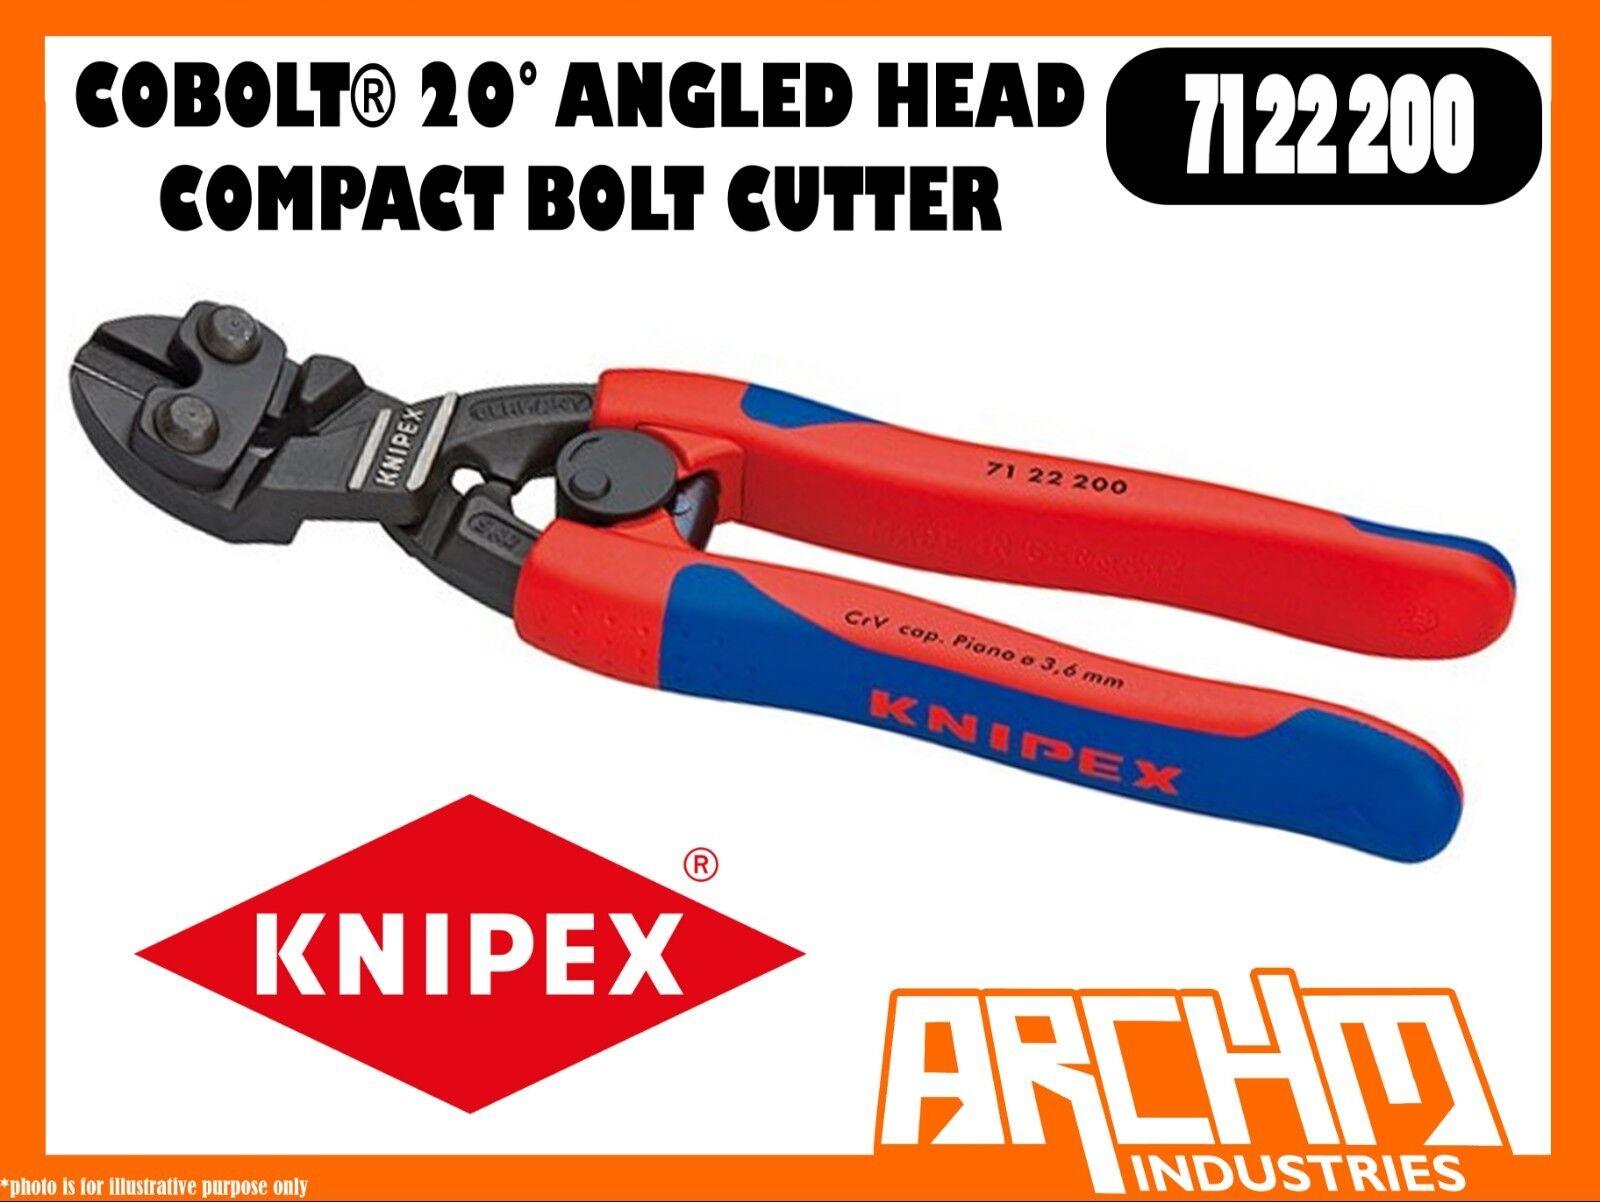 KNIPEX 7122200 - COBOLT® - COMPACT BOLT CUTTER 20° ANGLED HEAD - 200MM